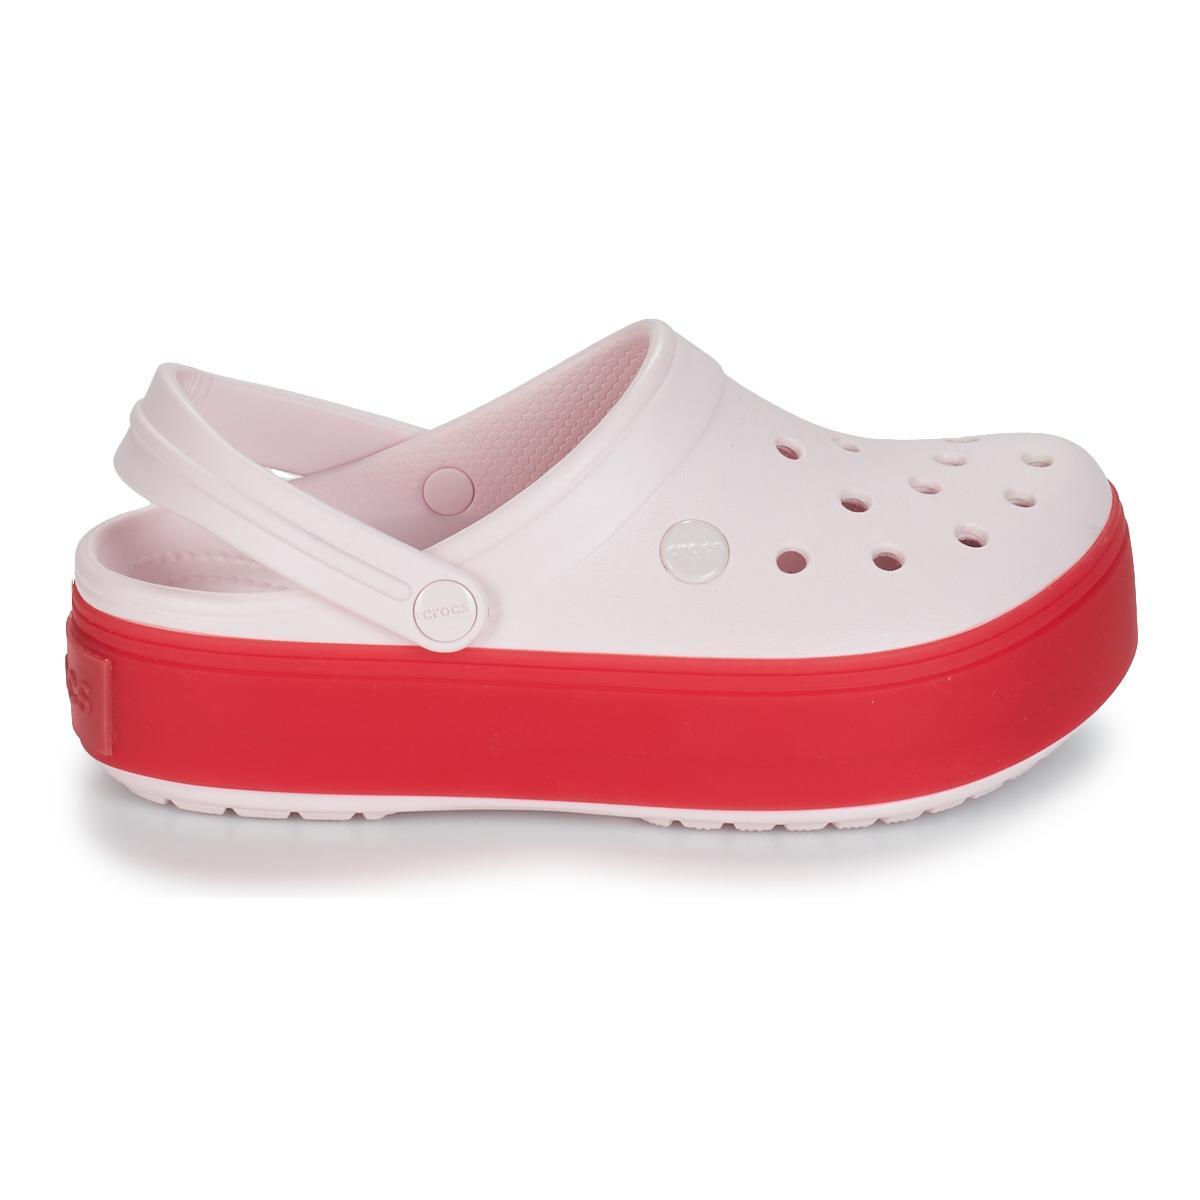 48153824bf7 Crocs™ - Pink Crocband Platform Clog - Lyst. View fullscreen